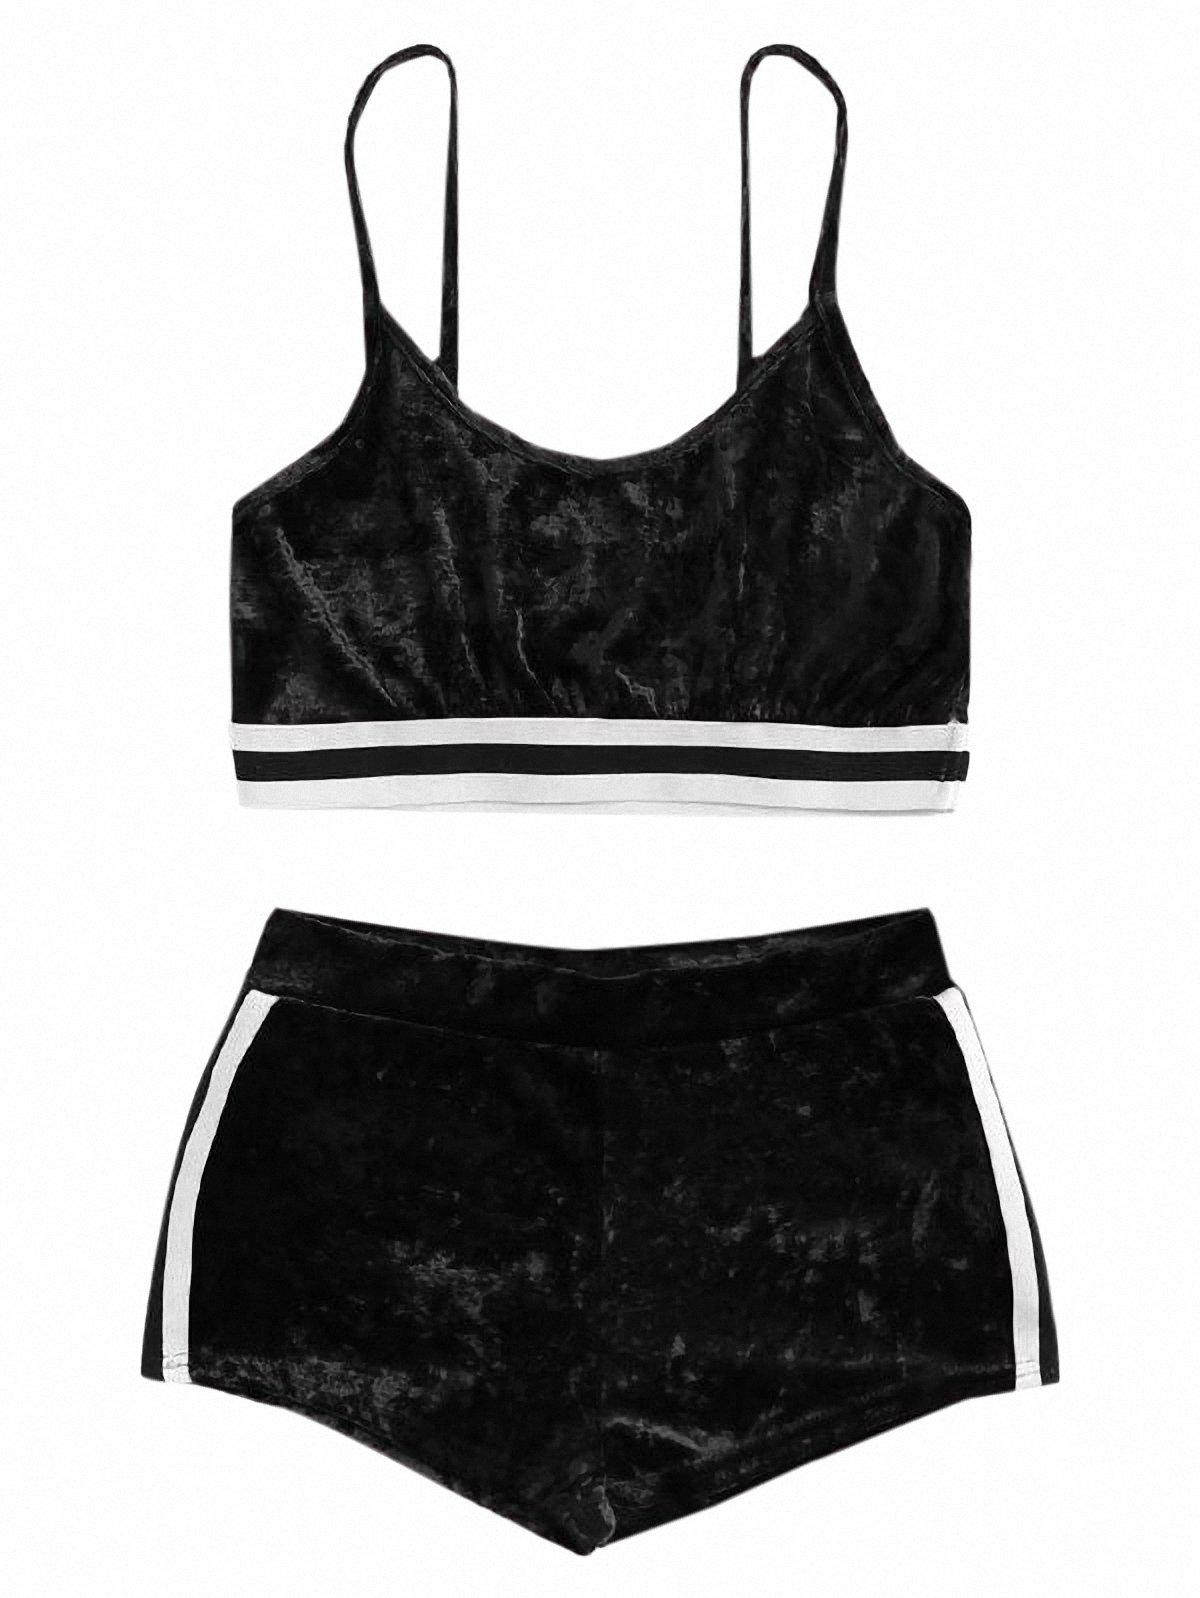 SweatyRocks Women's 2 Piece Velvet Spaghetti Strap Crop Tank Top and Shorts Set Tracksuits Black L